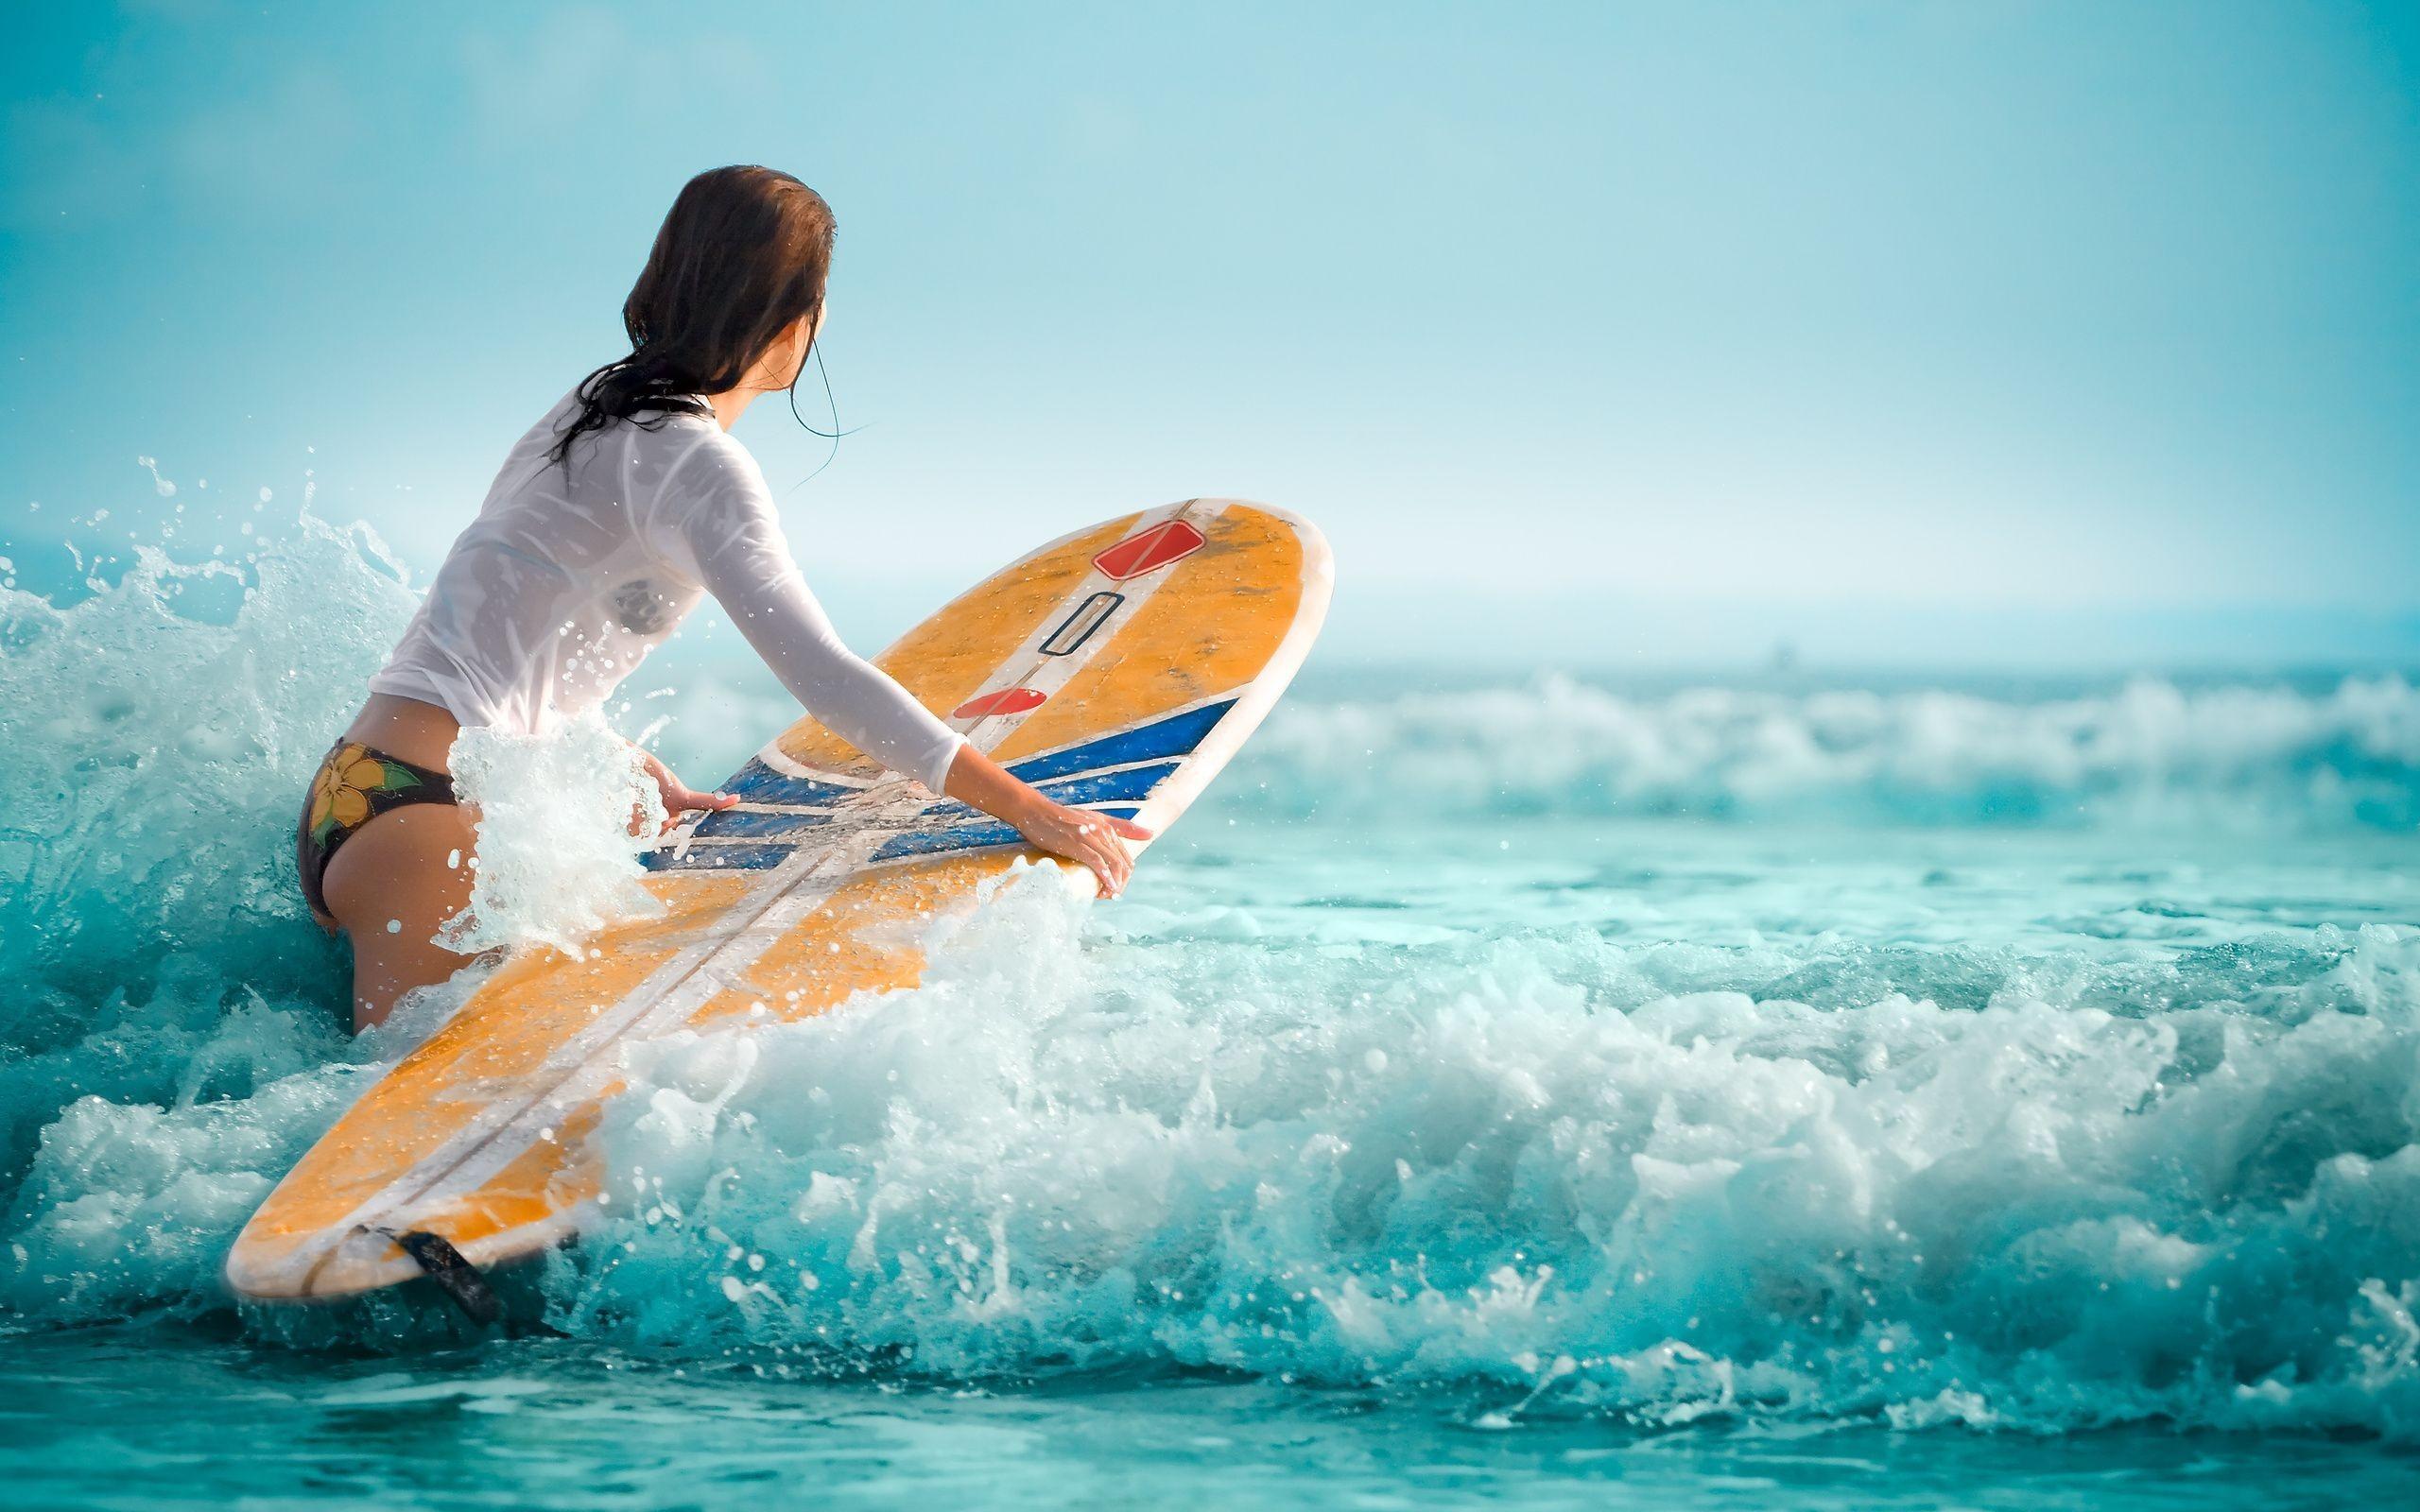 Hot surfing girl full hd wallpaper